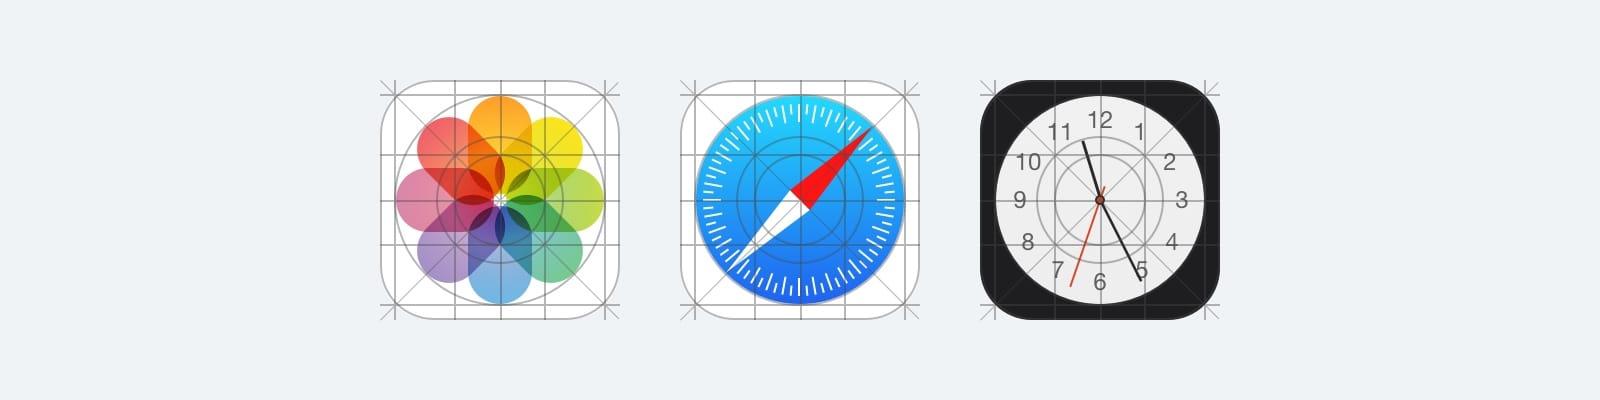 Дизайн под iPhone X. Гайдлайны для iOS 11 - 15